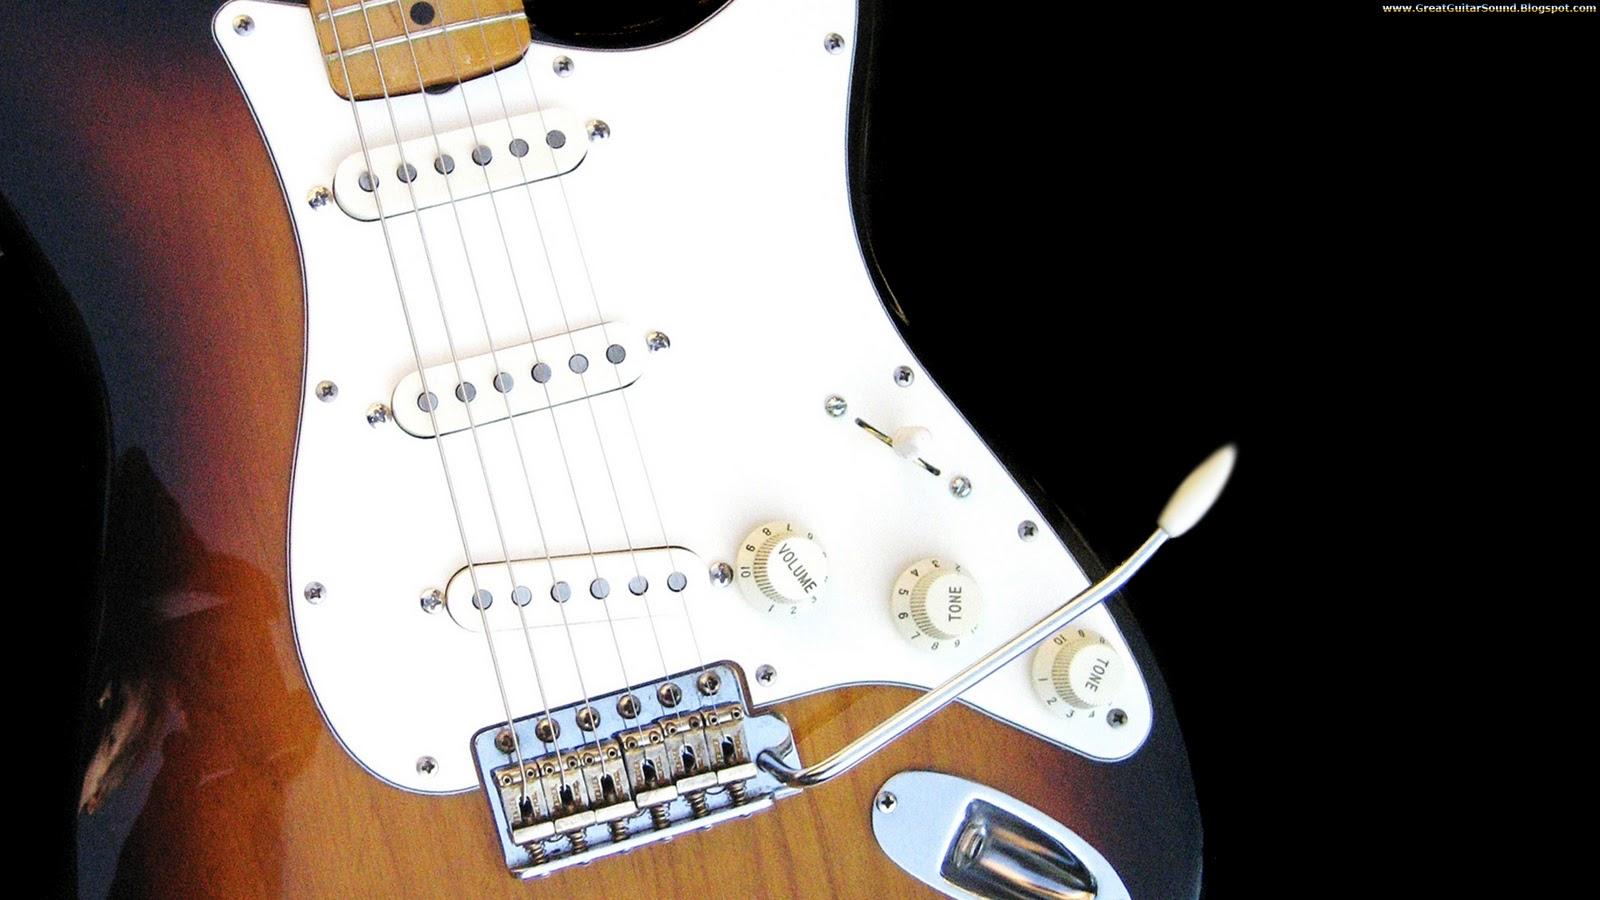 Fender Guitar Wallpapers For Desktop 2727 Hd Wallpapers in Music 1600x900